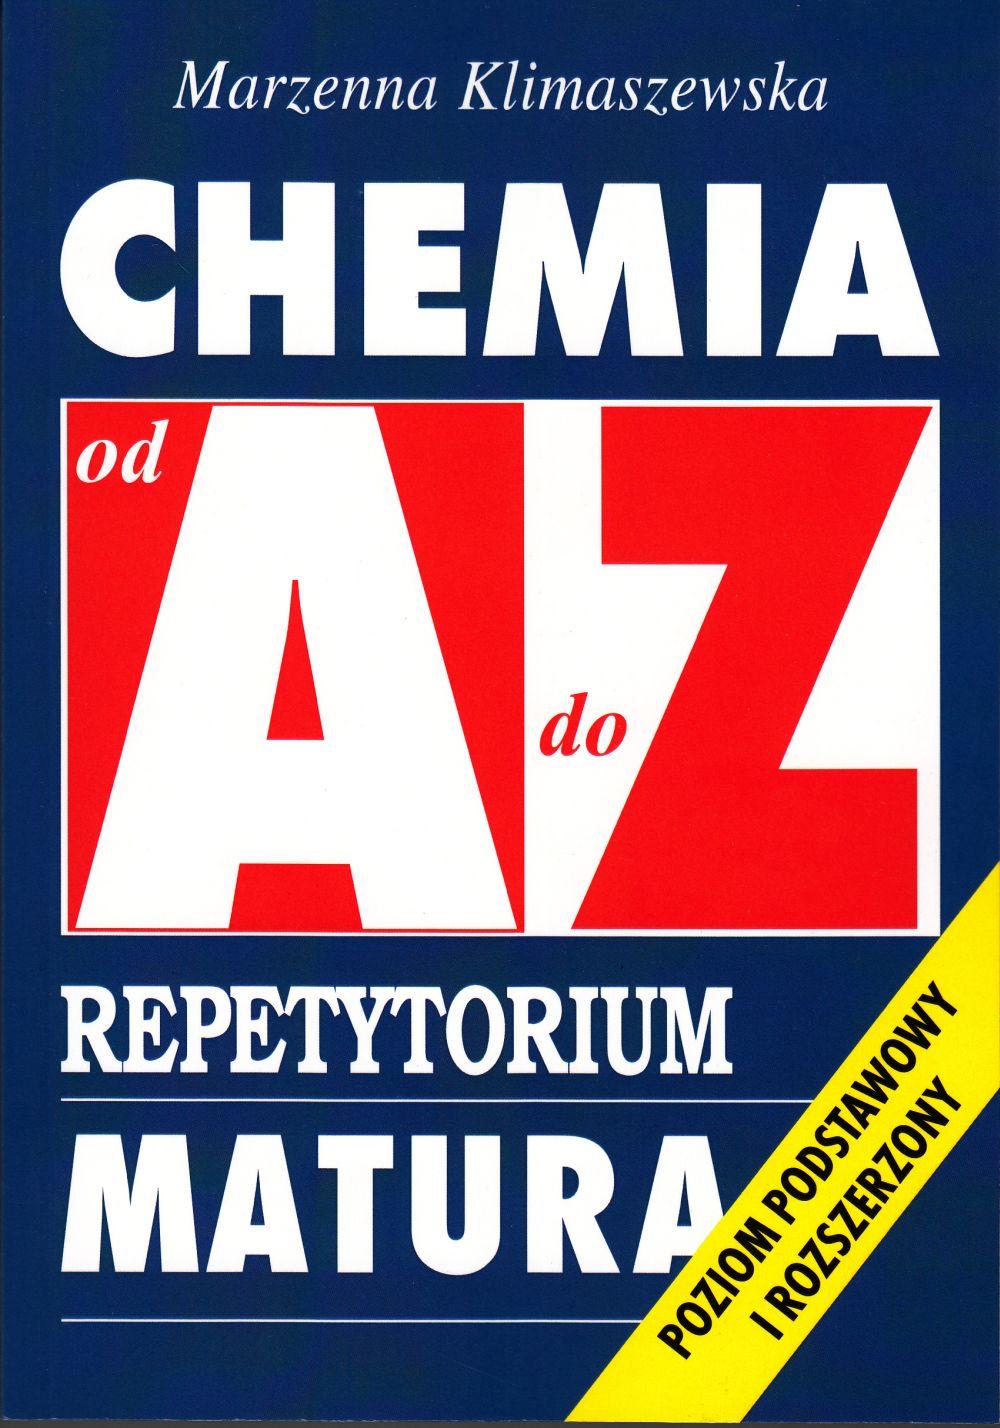 Chemia od A do Z. Repetytorium. Matura. PYTANIA TESTOWE